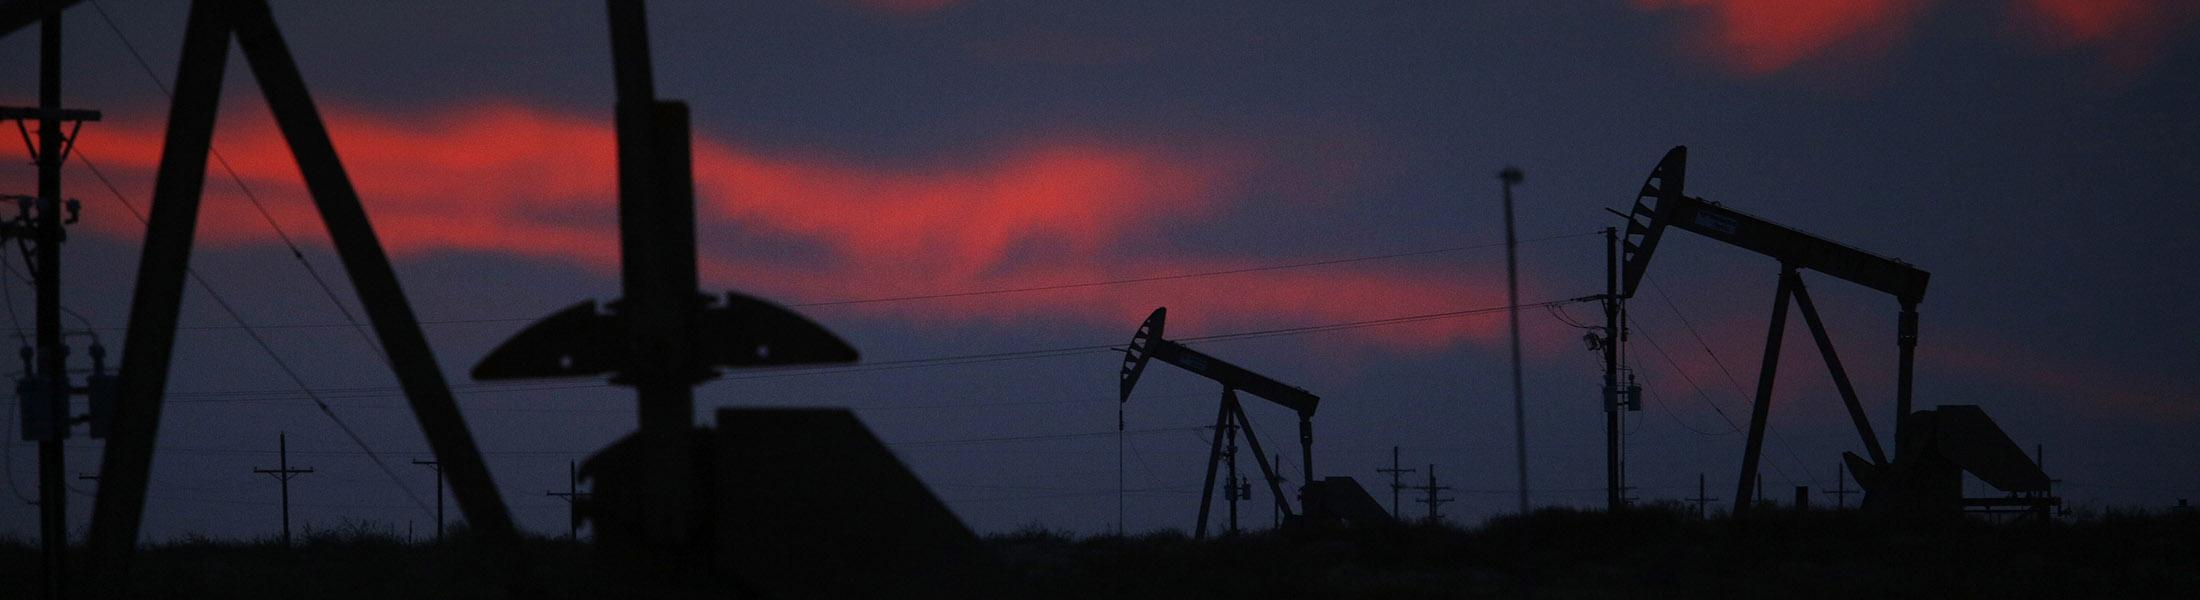 Pump jacks in the oil fields surrounding Midland.